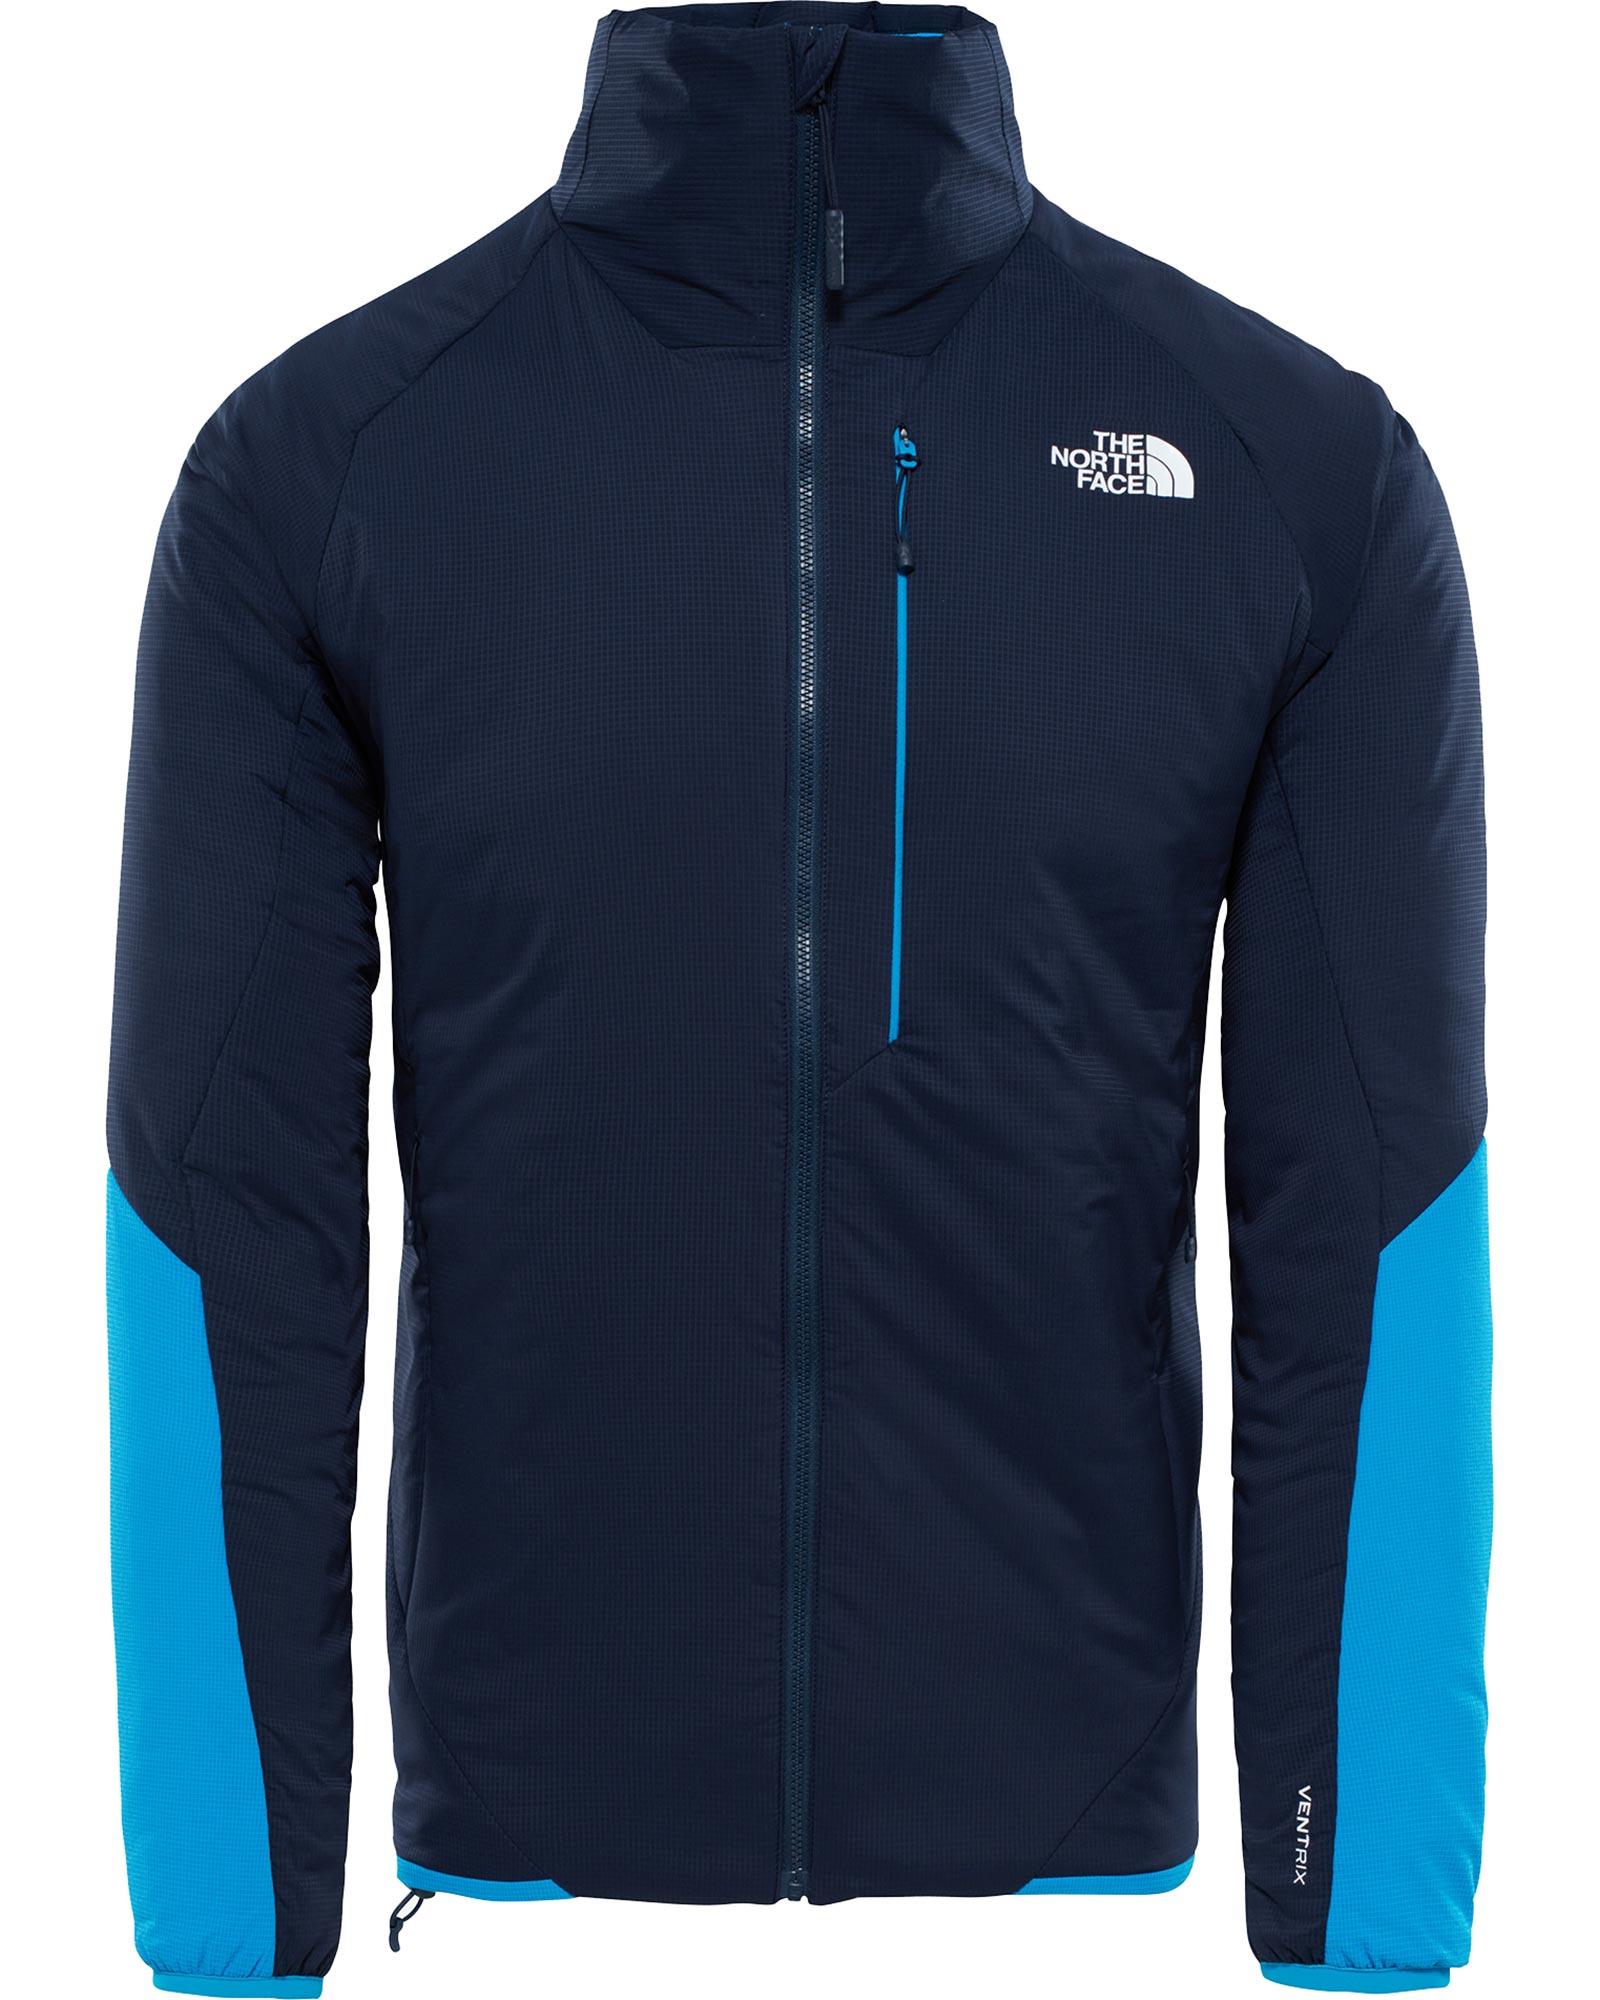 The North Face Ventrix Men's Jacket 0